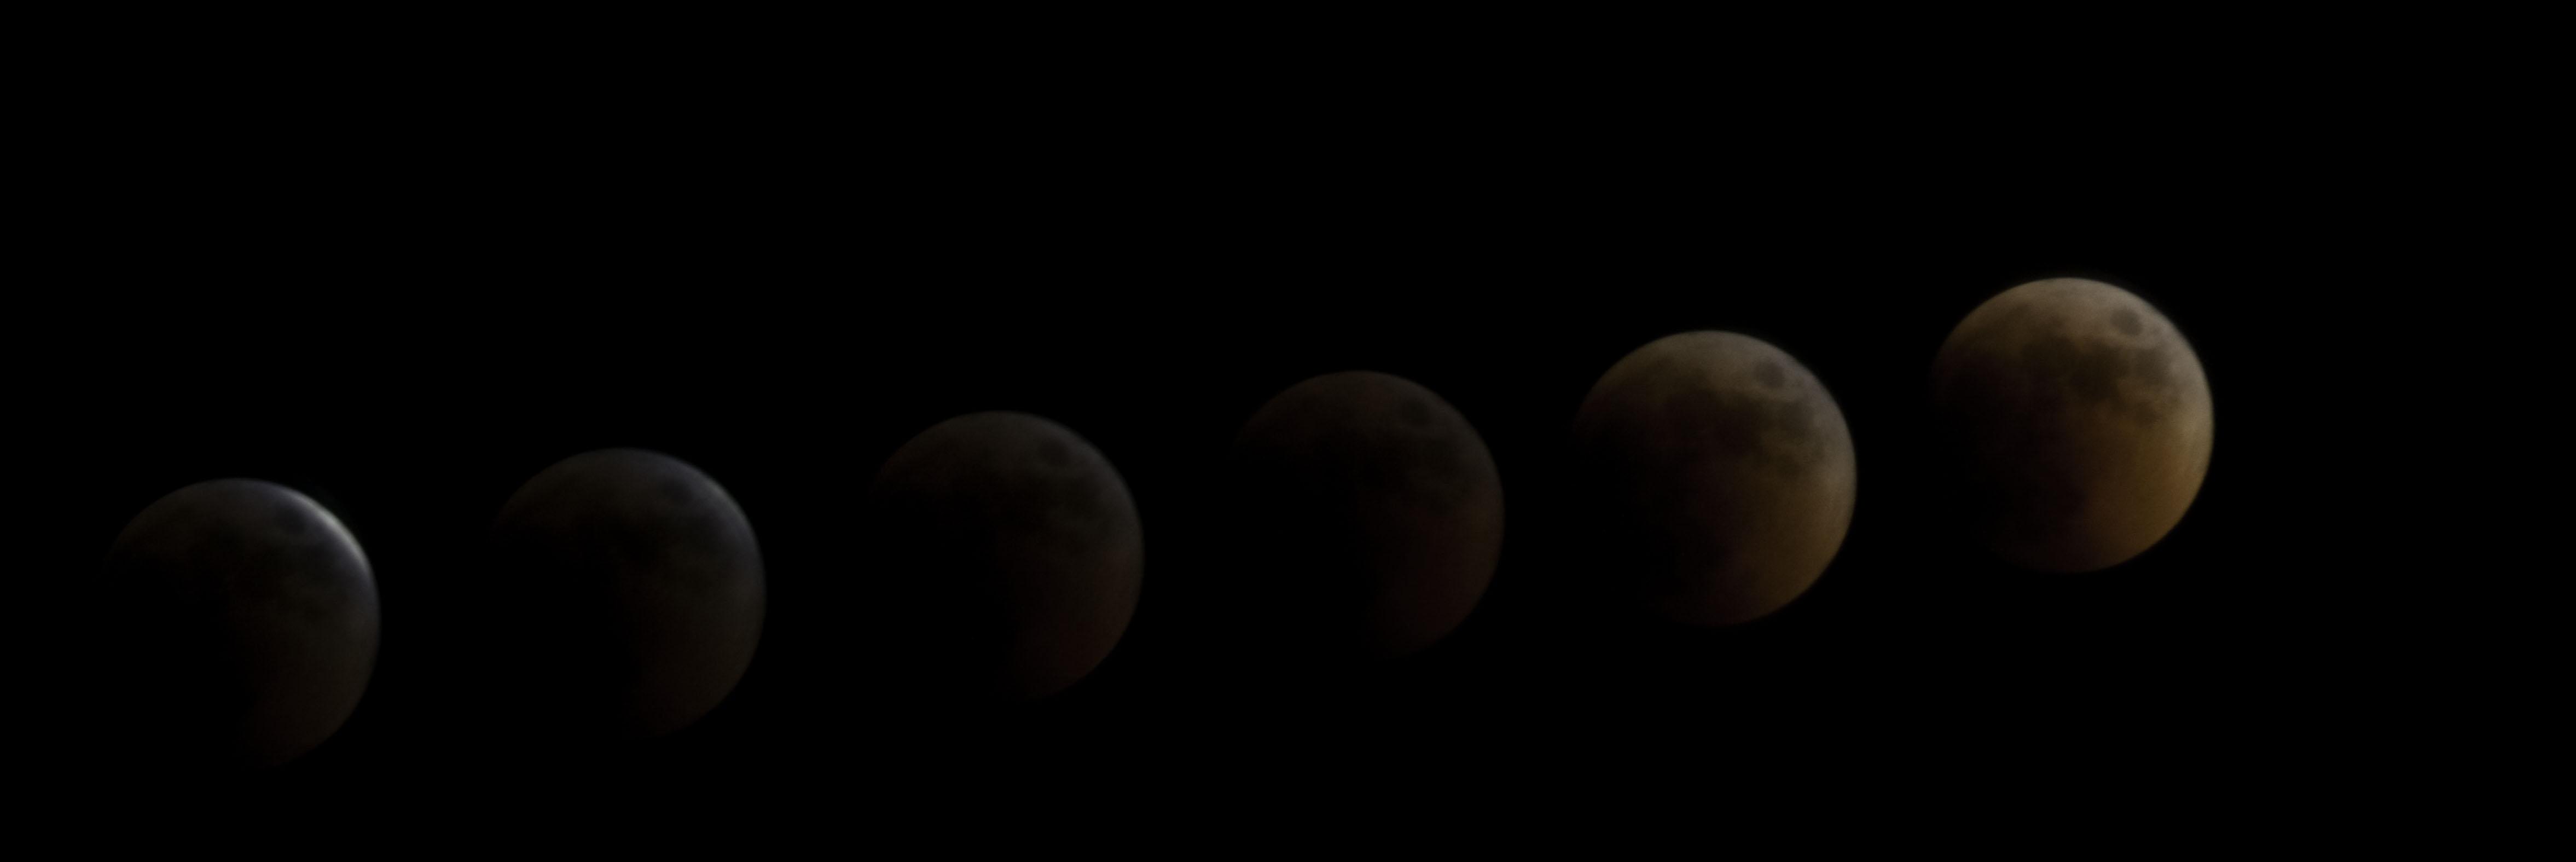 lunar1.jpg